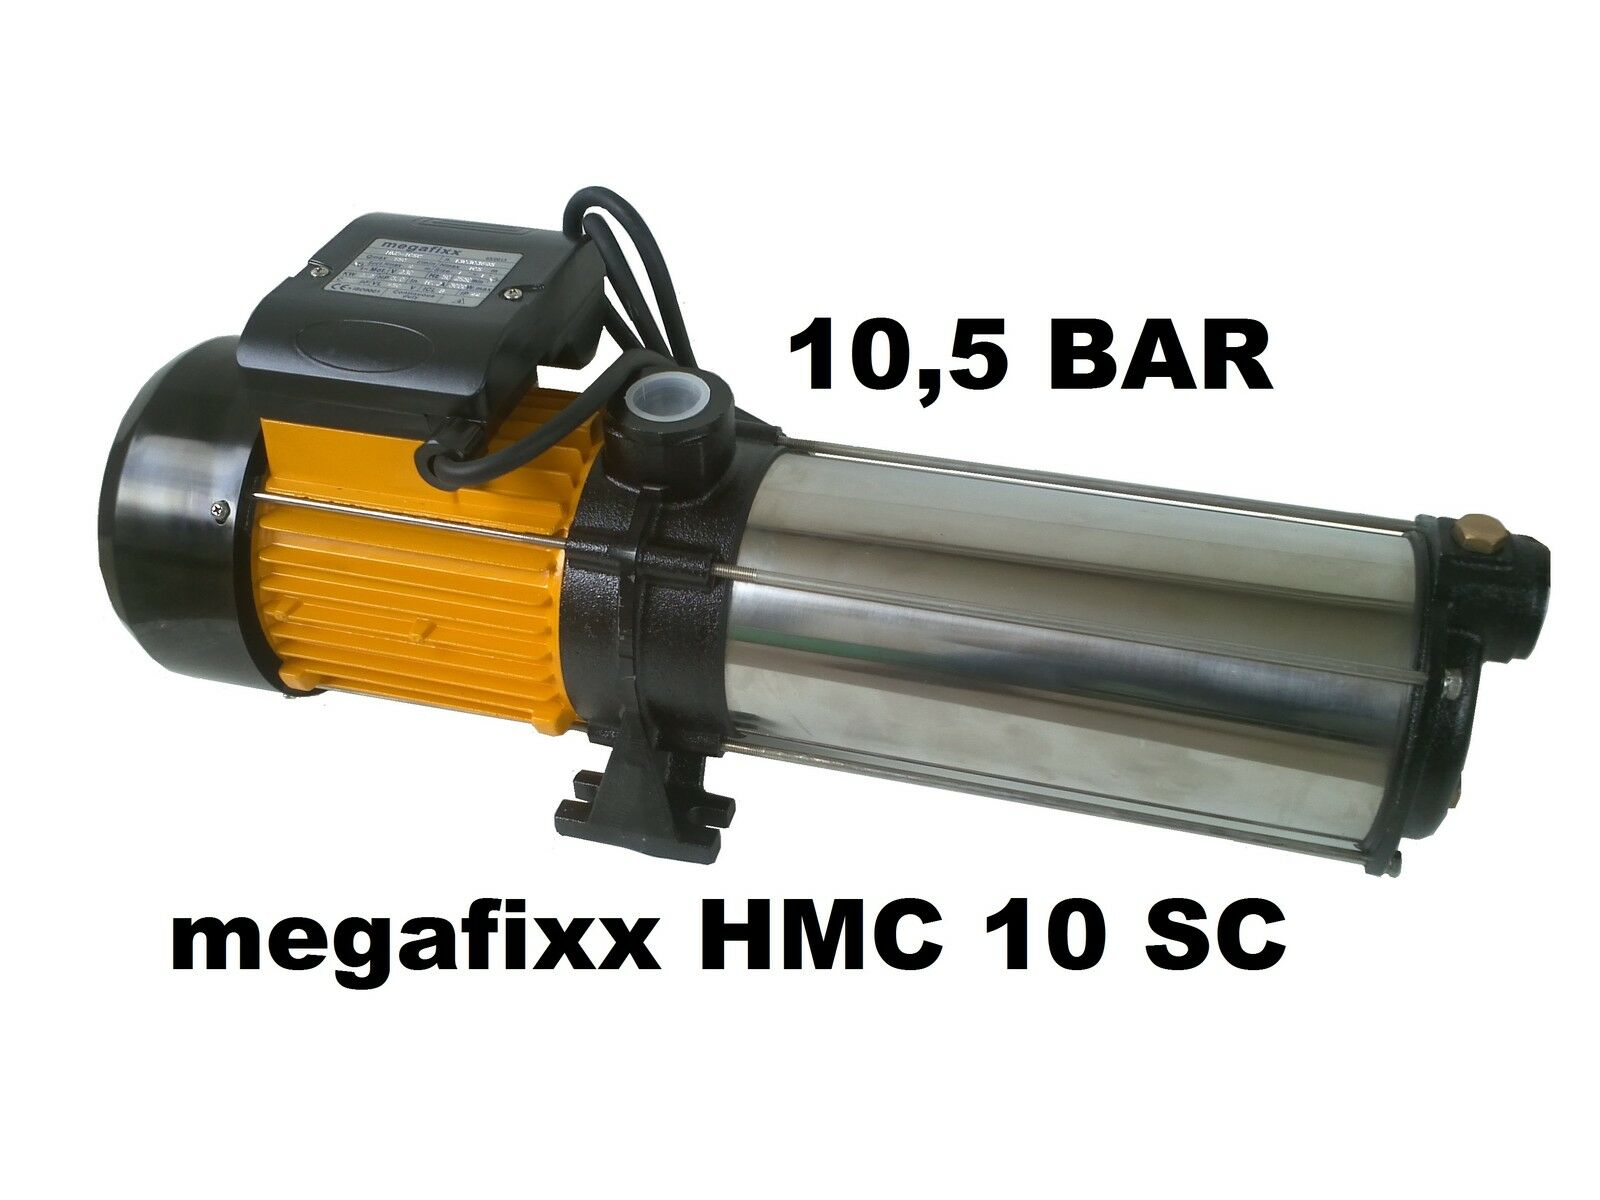 Kreiselpumpe megafixx HMC10SC mehrstufig 10 Edelstahl Laufräder 10 BAR 2200 Watt